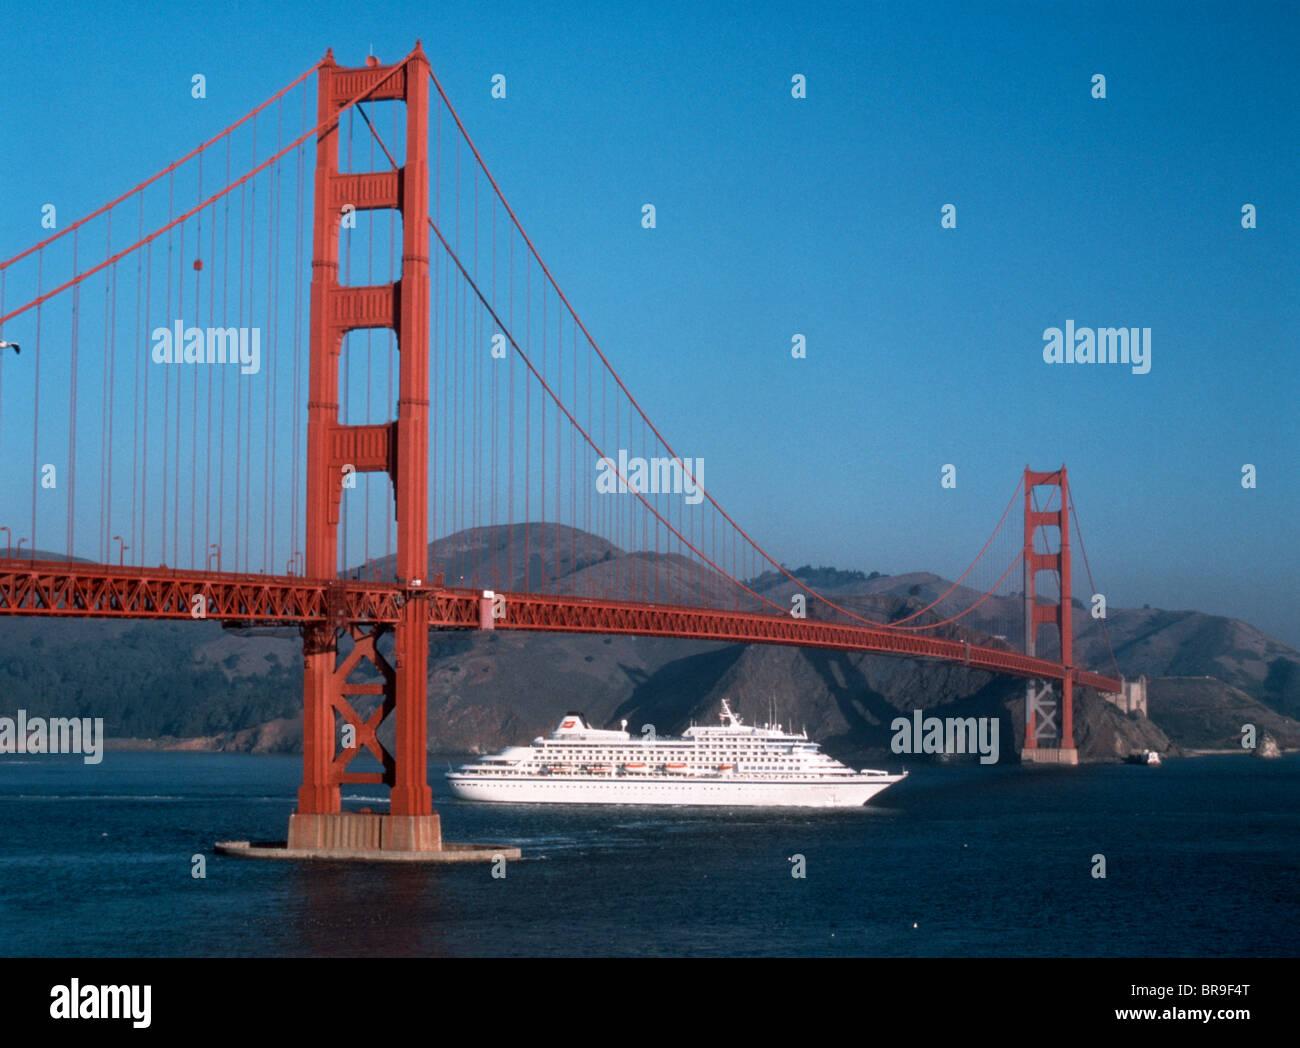 CRUISE SHIP RETURNING UNDER GOLDEN GATE BRIDGE SAN FRANCISCO CALIFORNIA - Stock Image